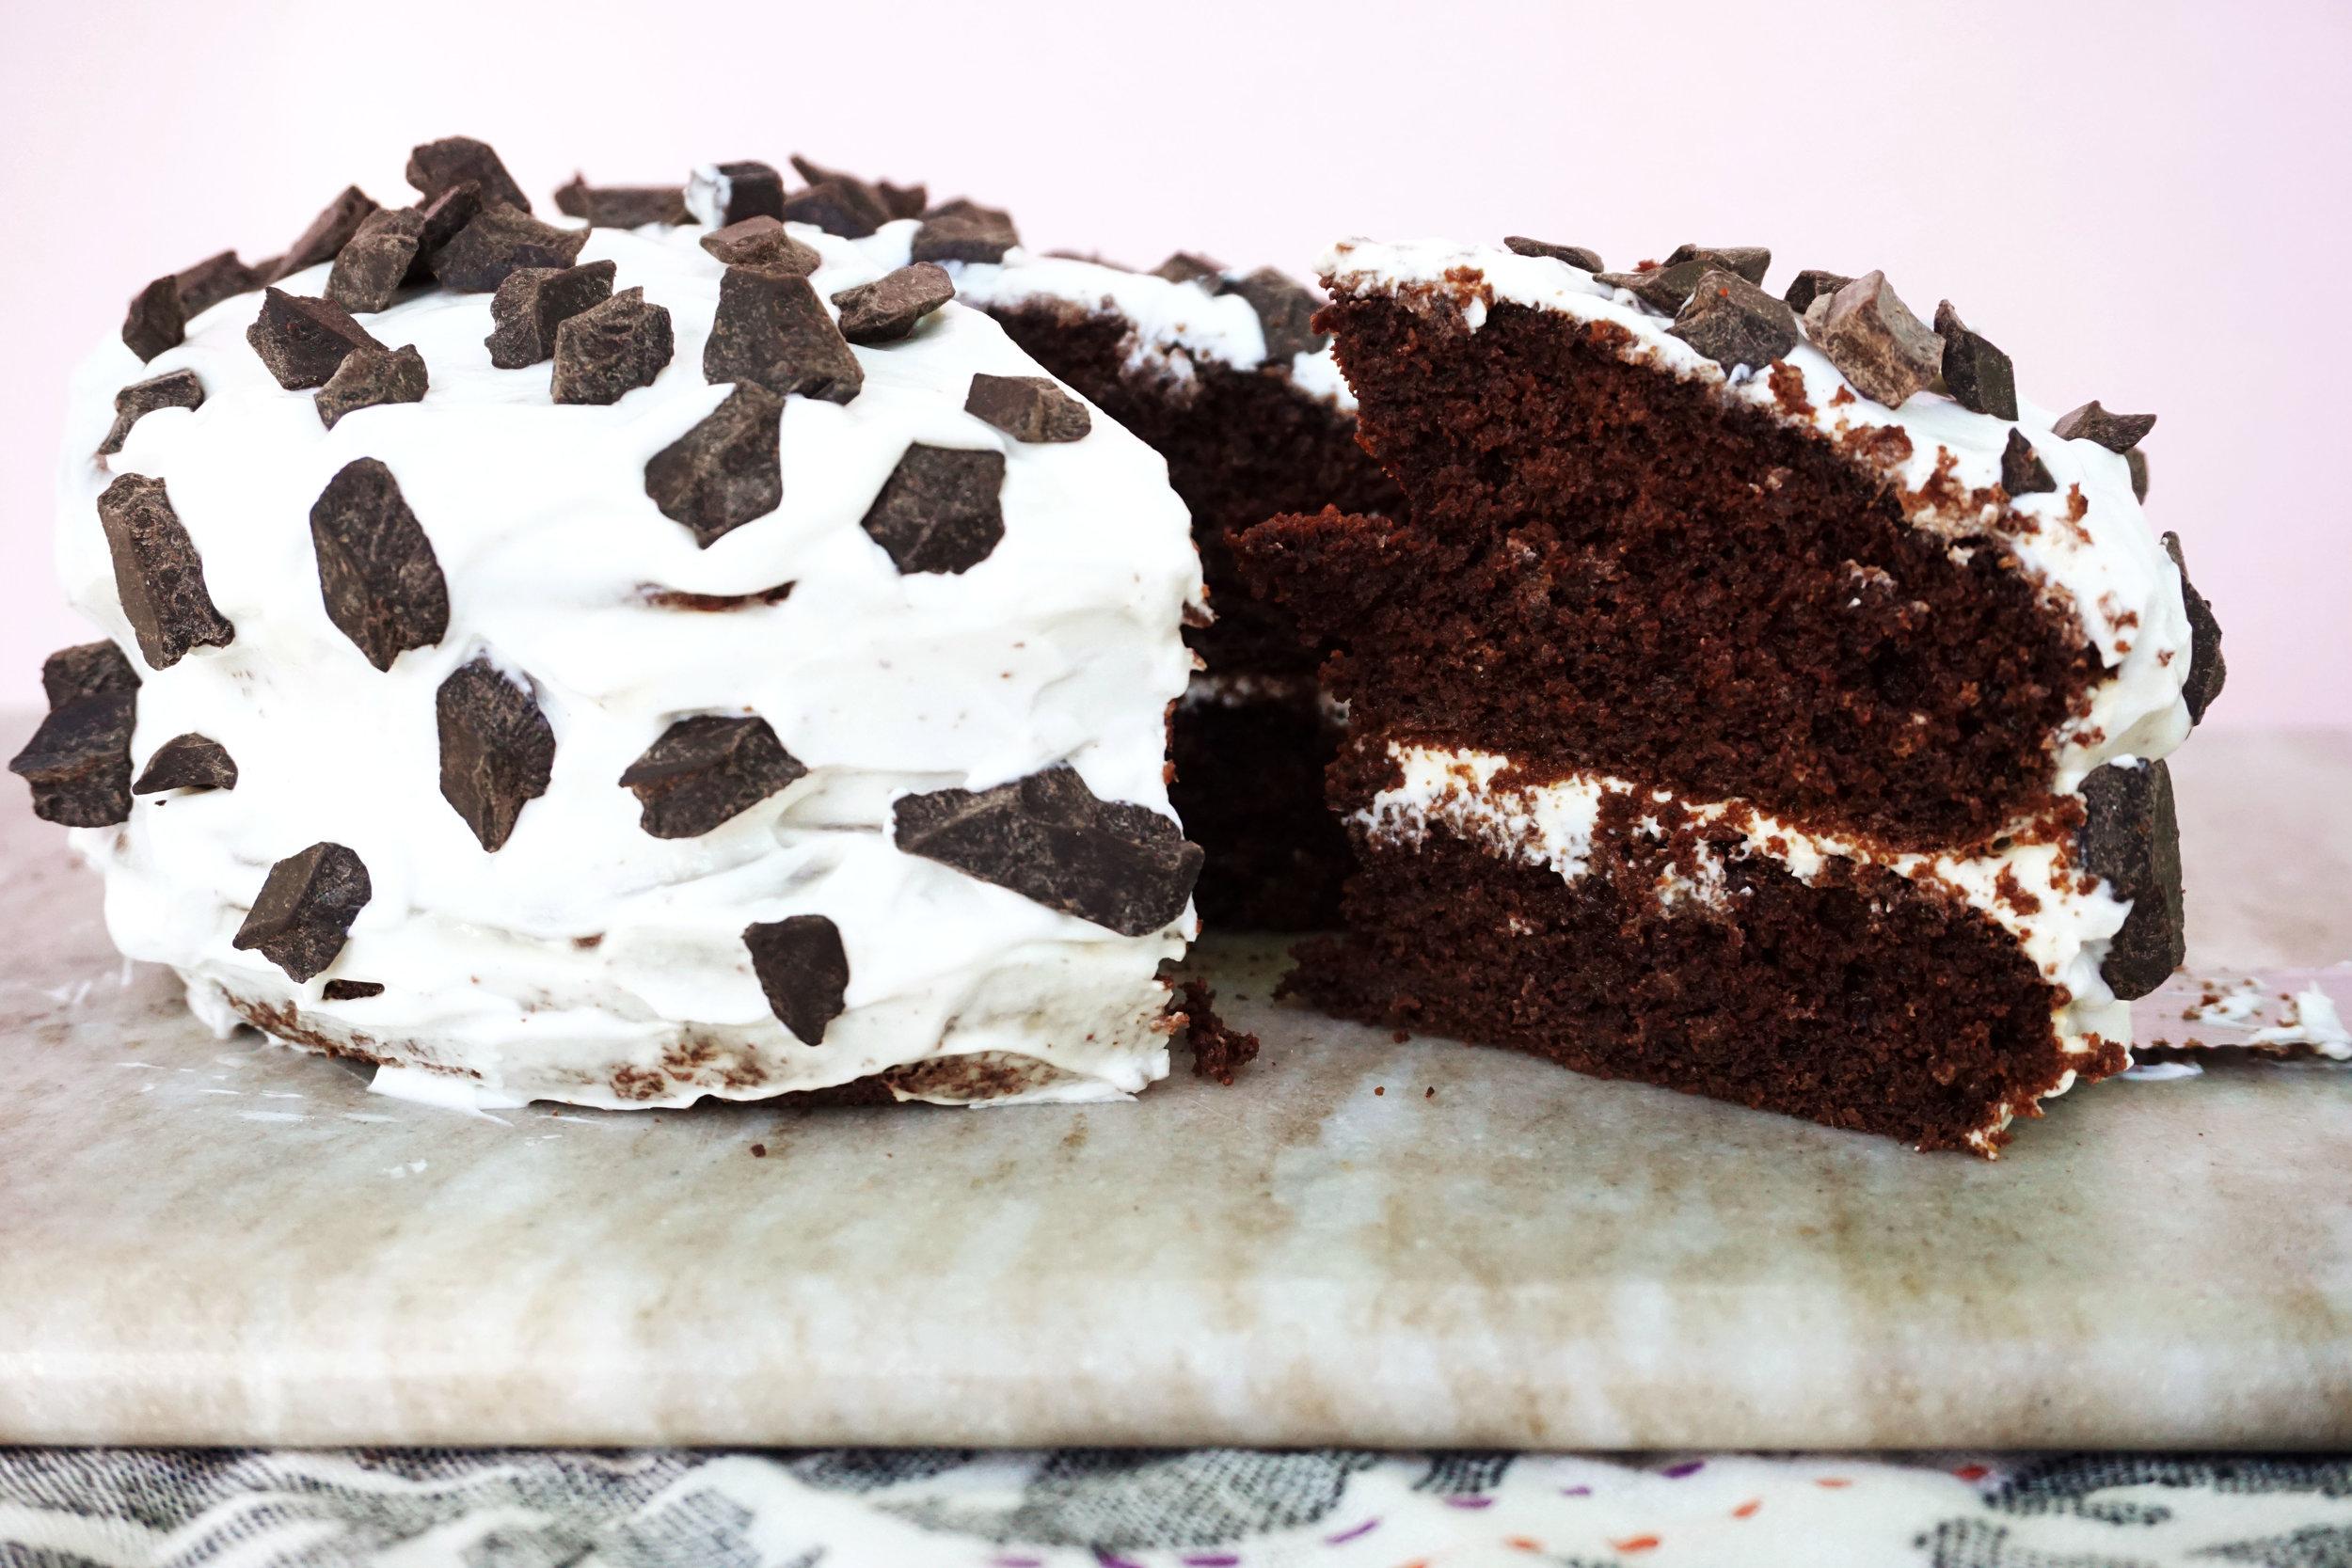 Chocolate-Studded Chocolate Cake w/ Vanilla Yogurt Frosting